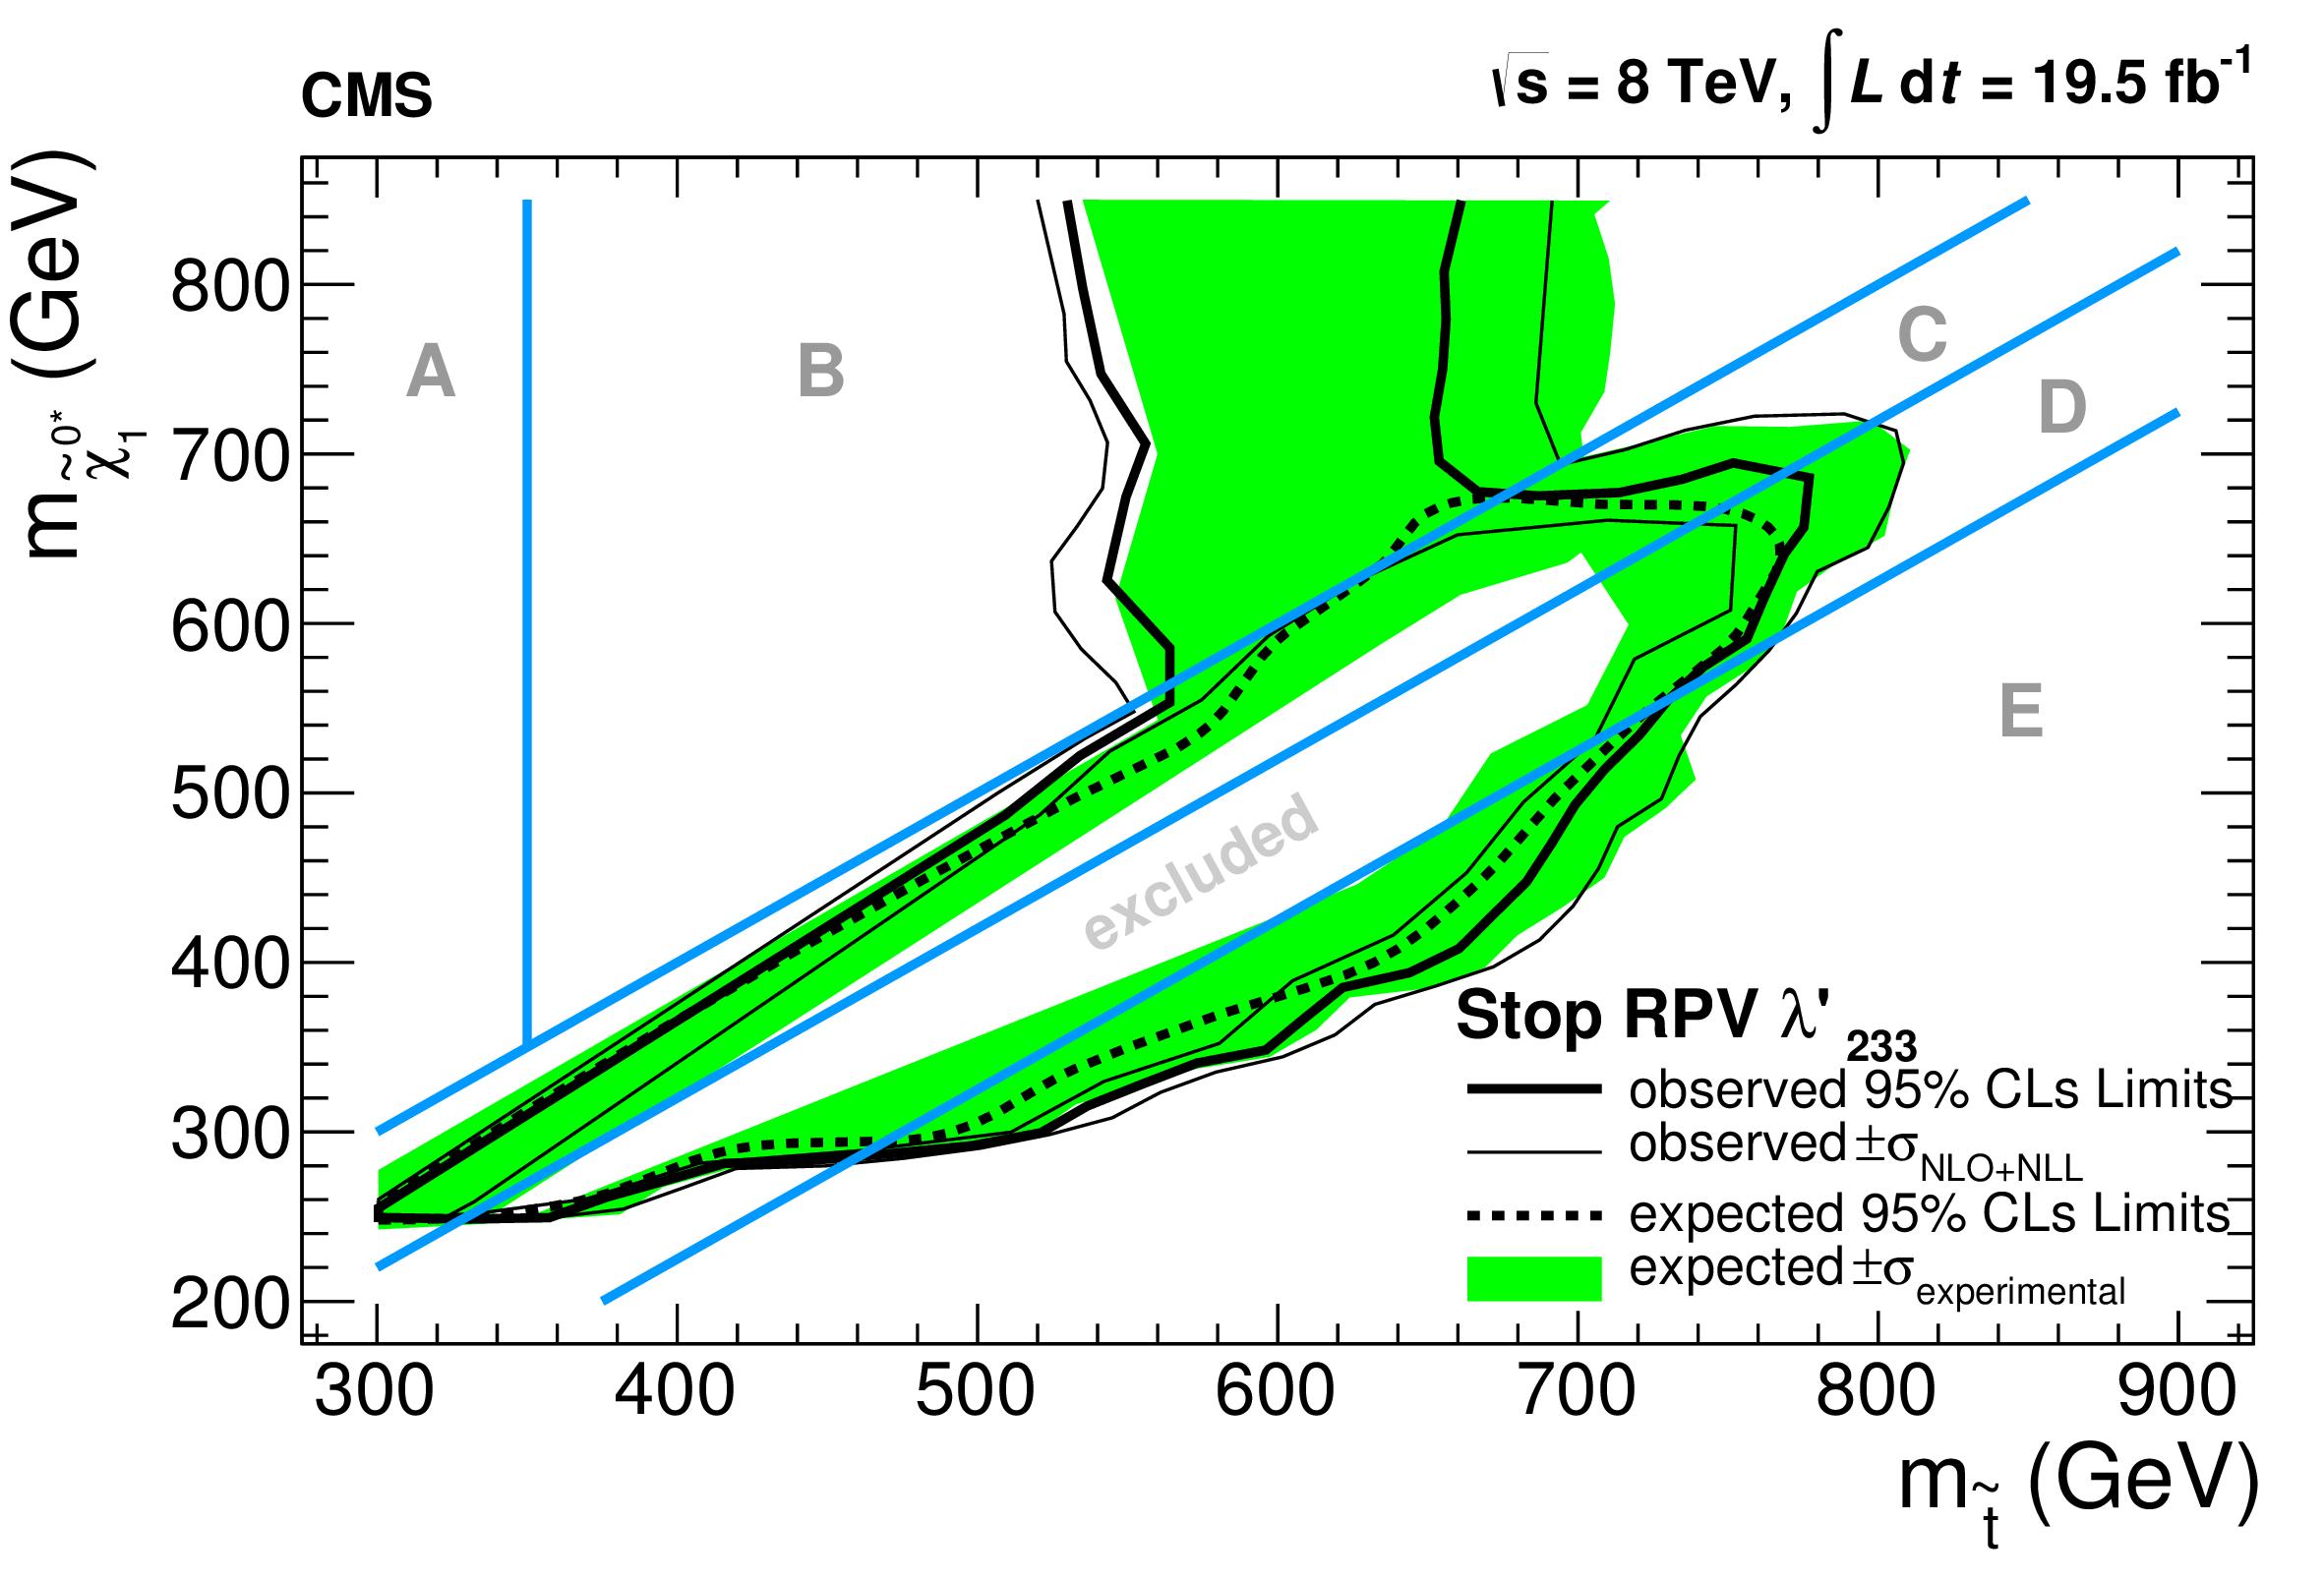 curve_StopRPV_LQD233.png